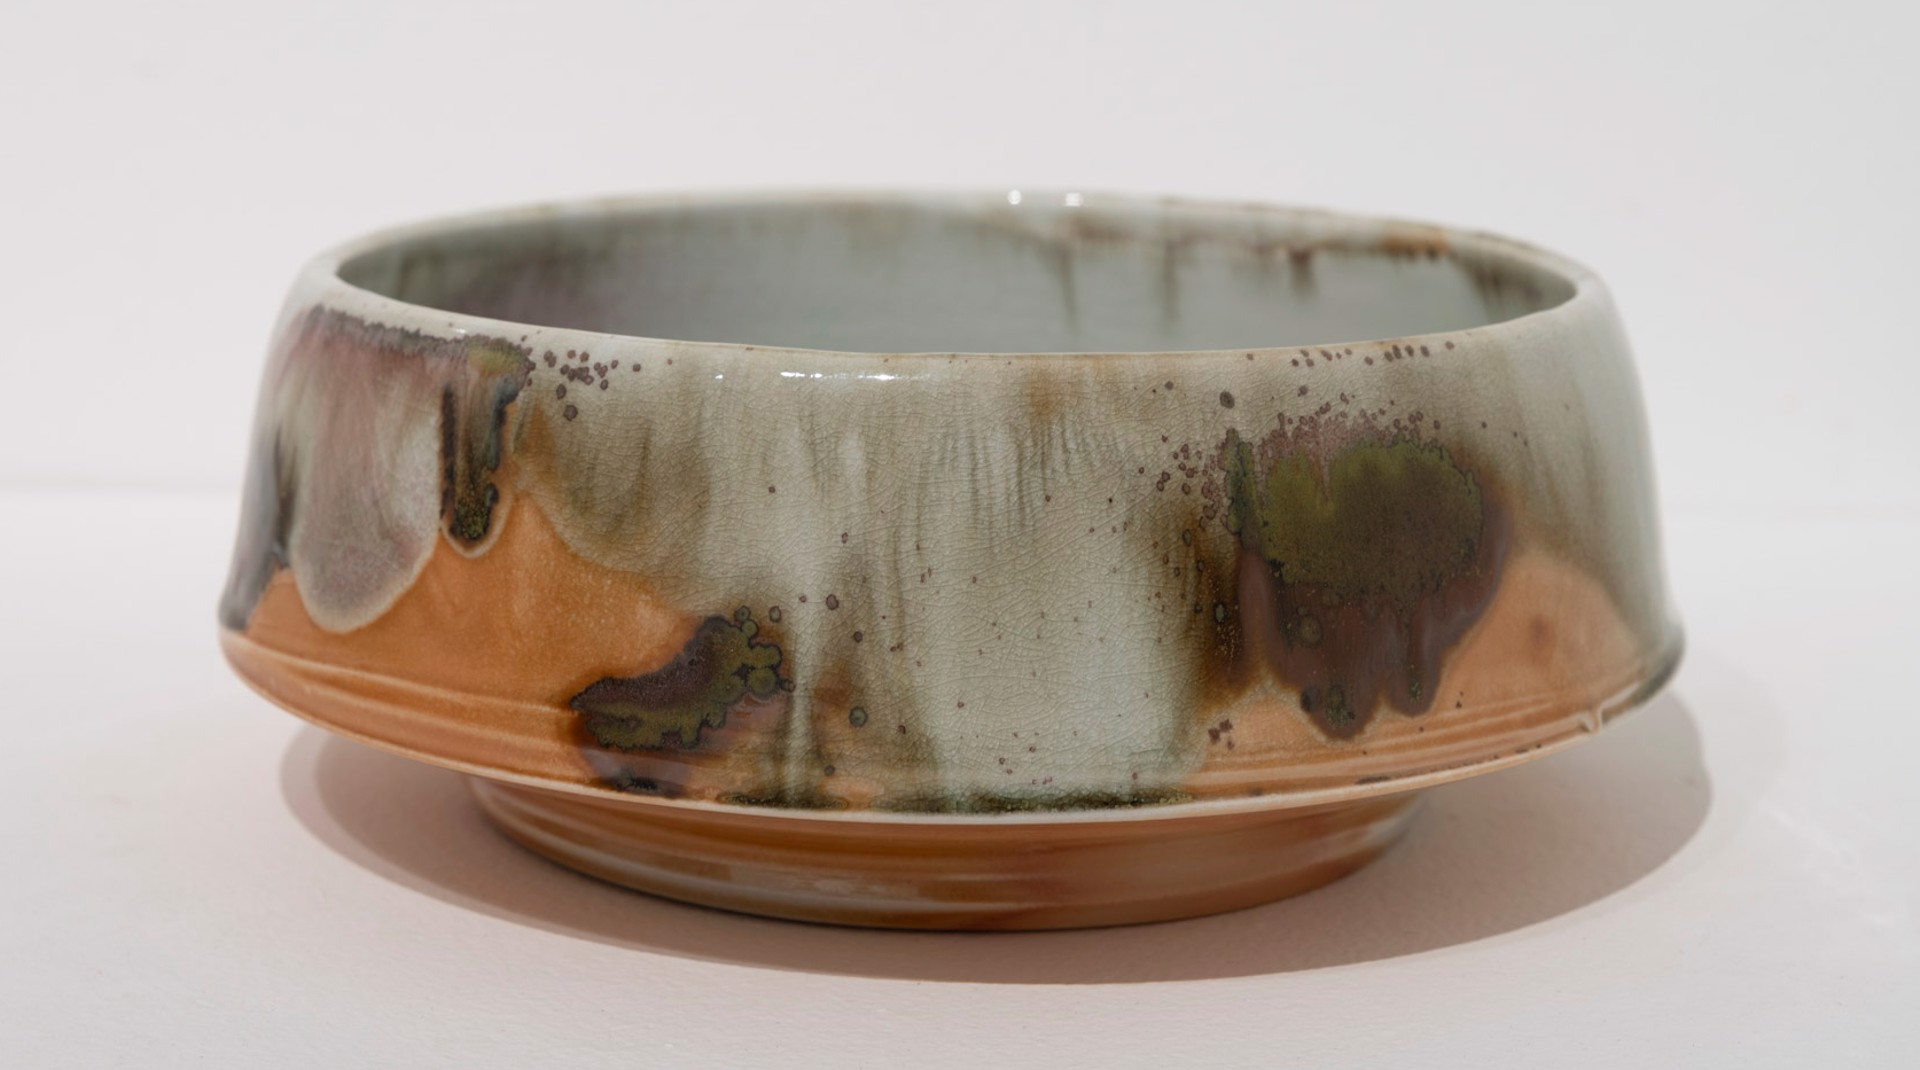 Bowl by Stephen Mickey